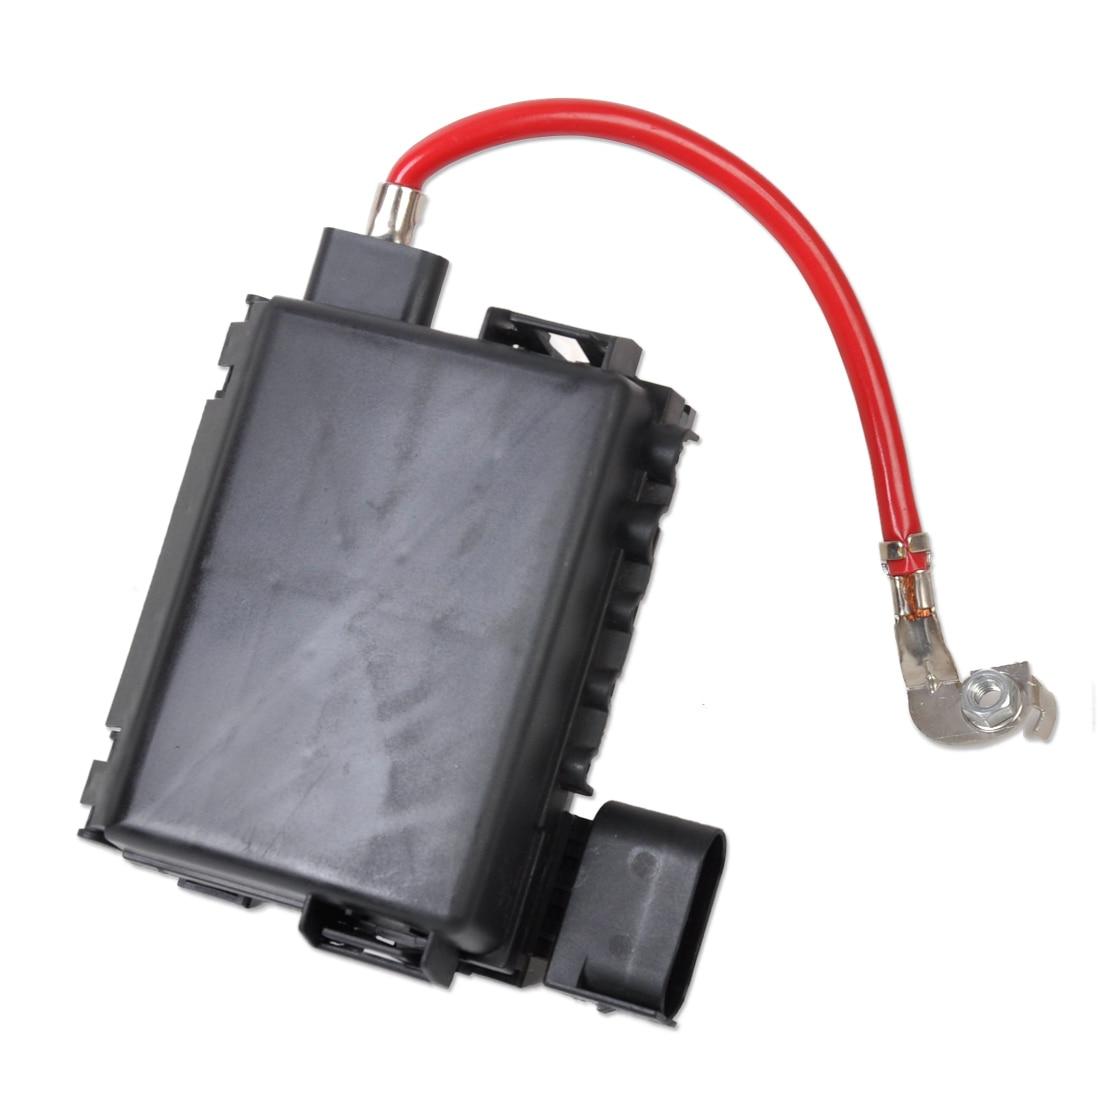 dwcx 1j0937550a black fuse box battery terminal for volkswagen vw beetle golf jetta bora mk4 audi [ 1110 x 1110 Pixel ]